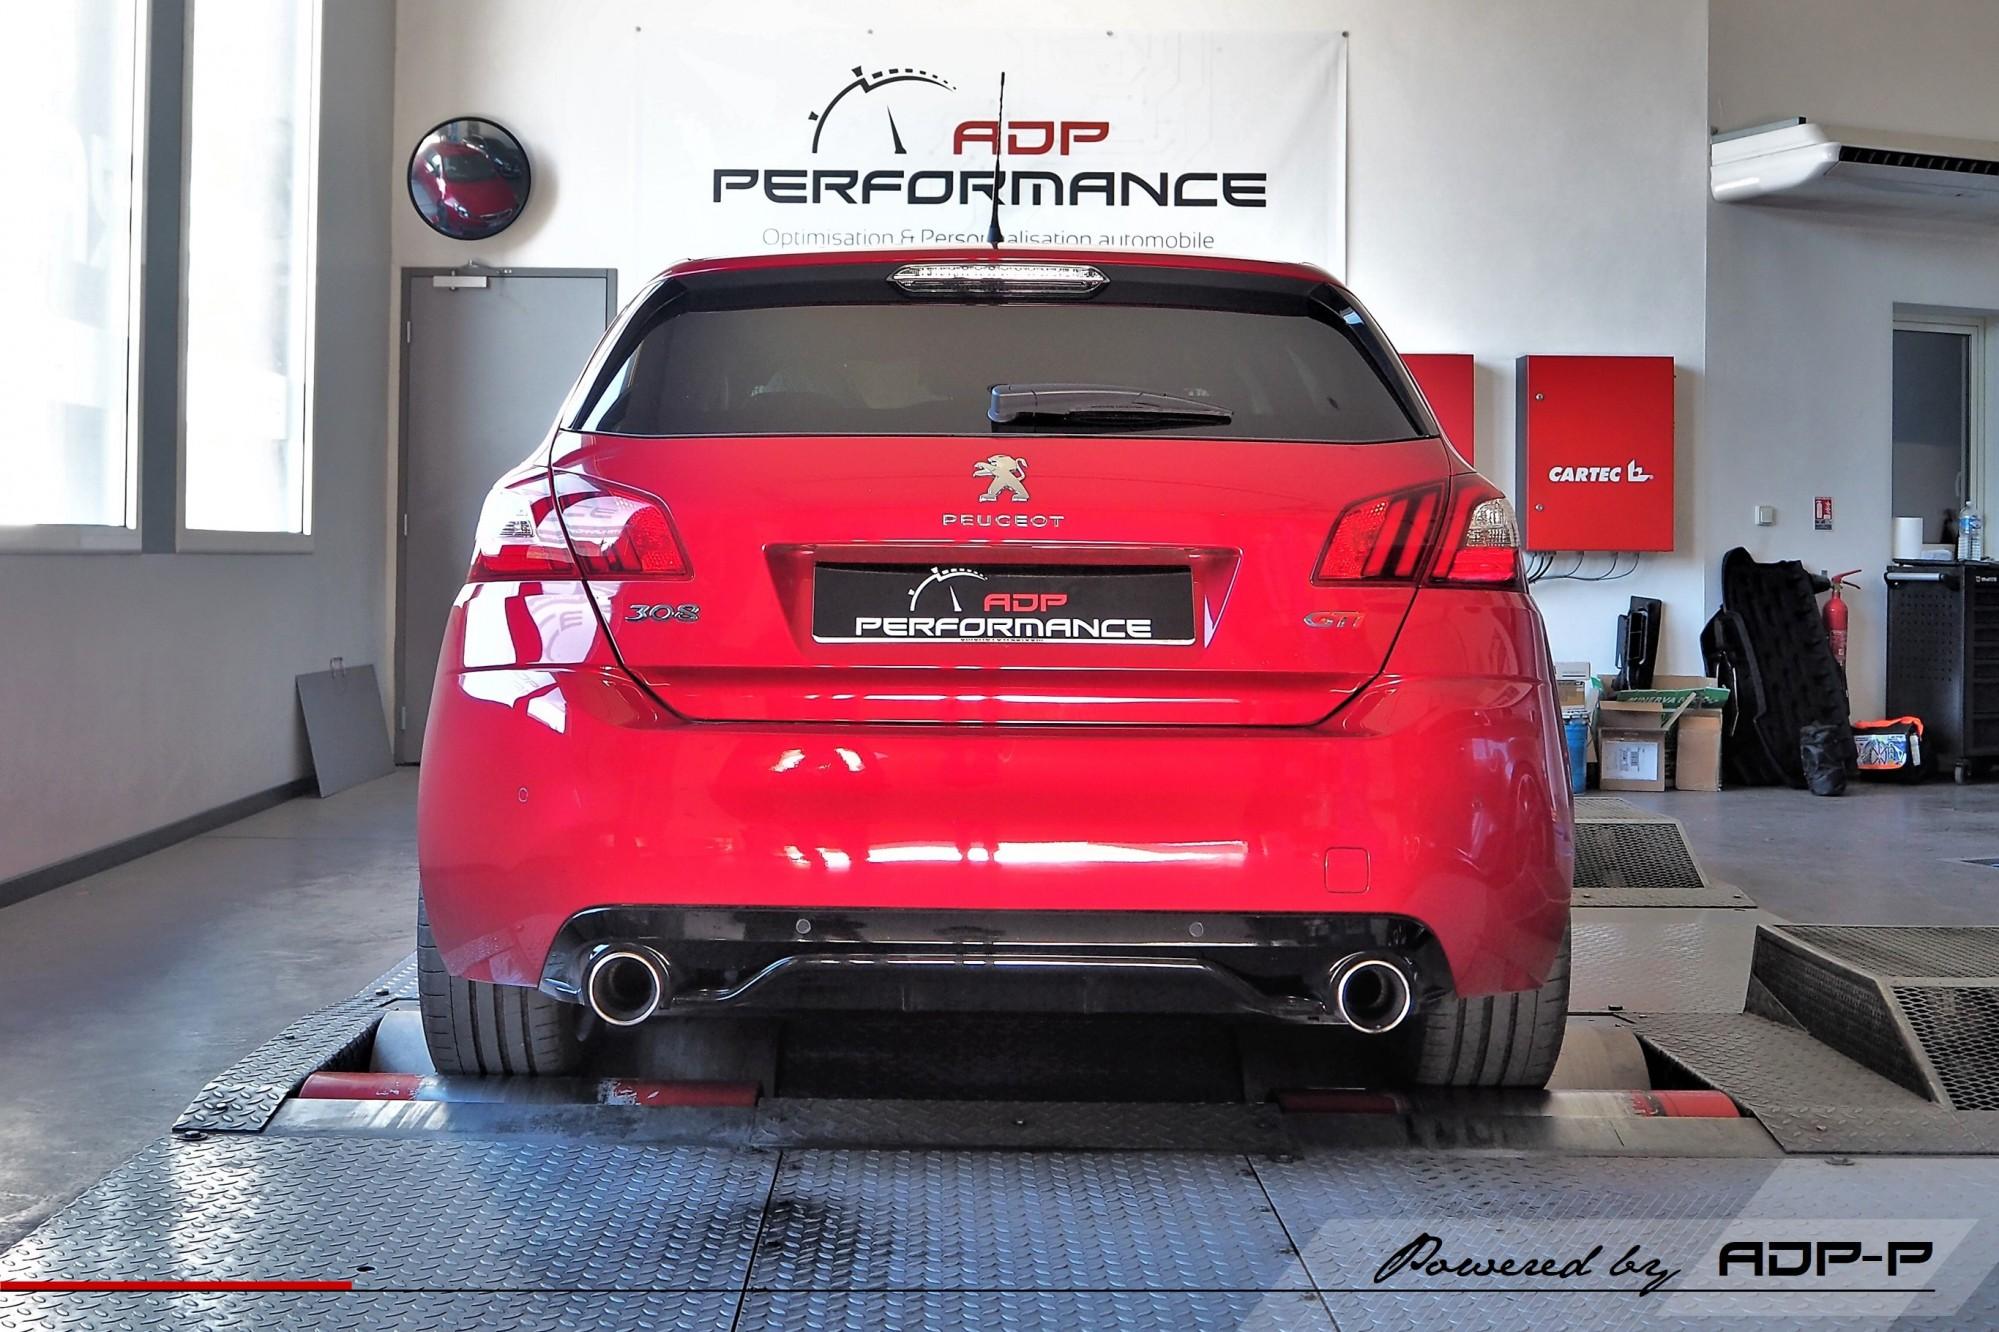 Reprogrammation moteur Aix en Provence, Marseille, Avignon - Peugeot 308 GTI 1.6 THP 270cv - ADP Performance